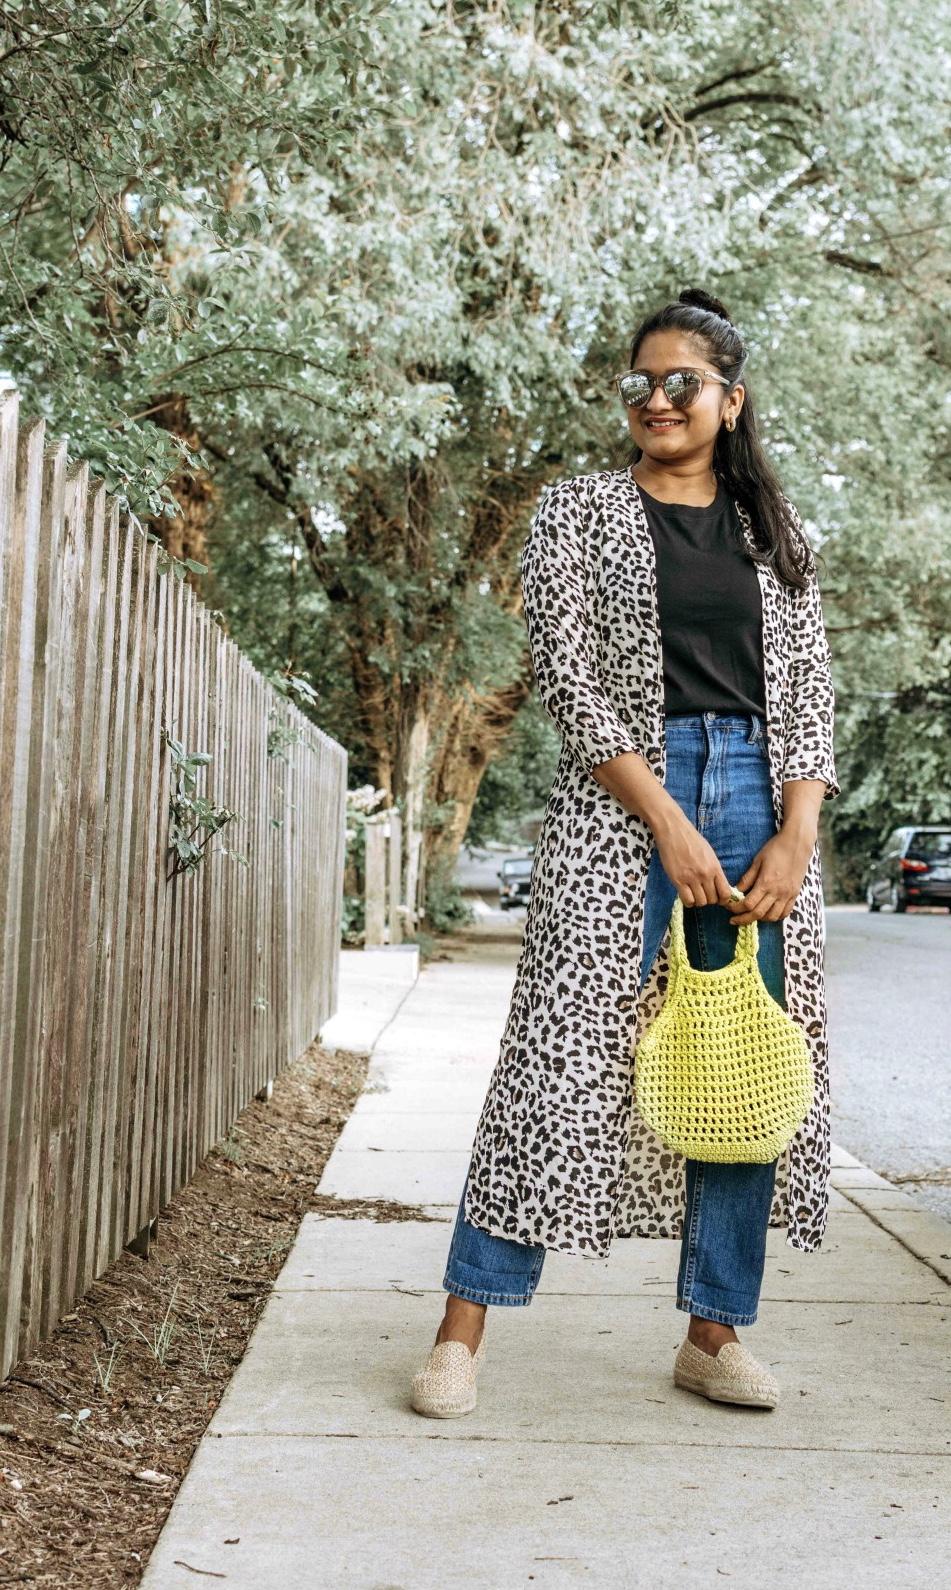 Wearing Everlane summer jeans, Cotton Box-Cut Tee, leopard print kimono, Raffia Espadrilles 5